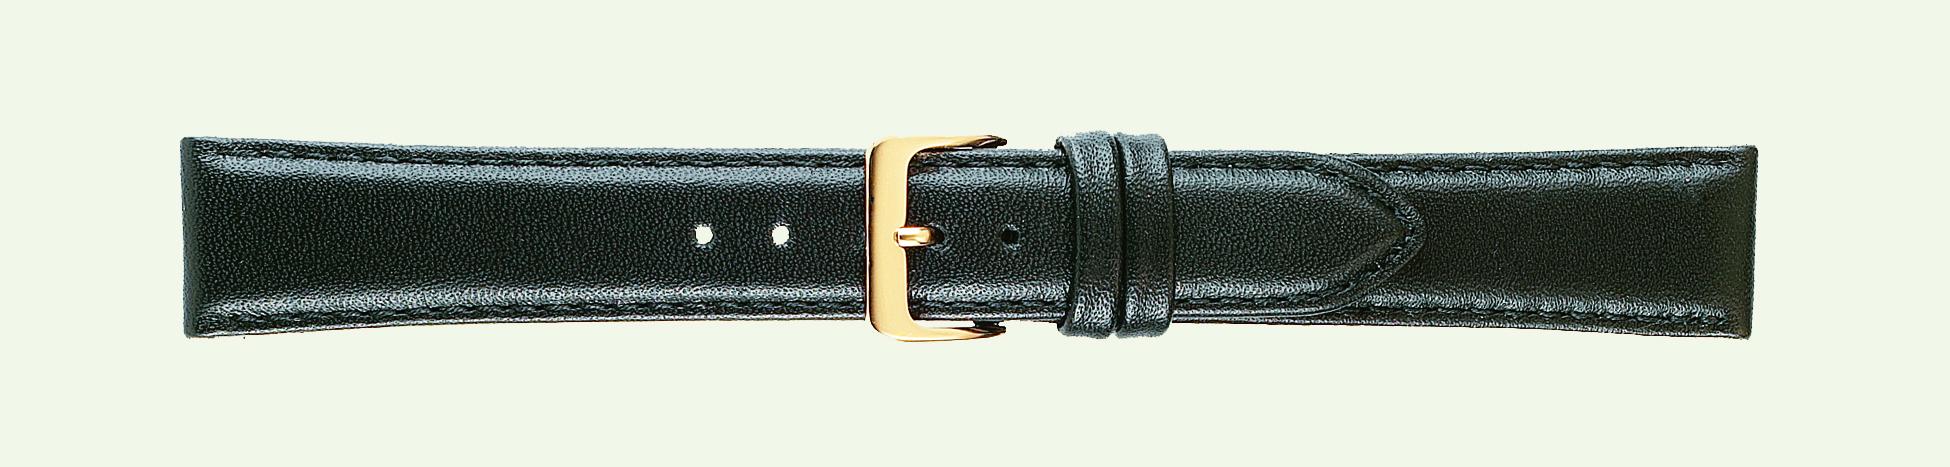 14MM Leather Band Black Classic Calf-0